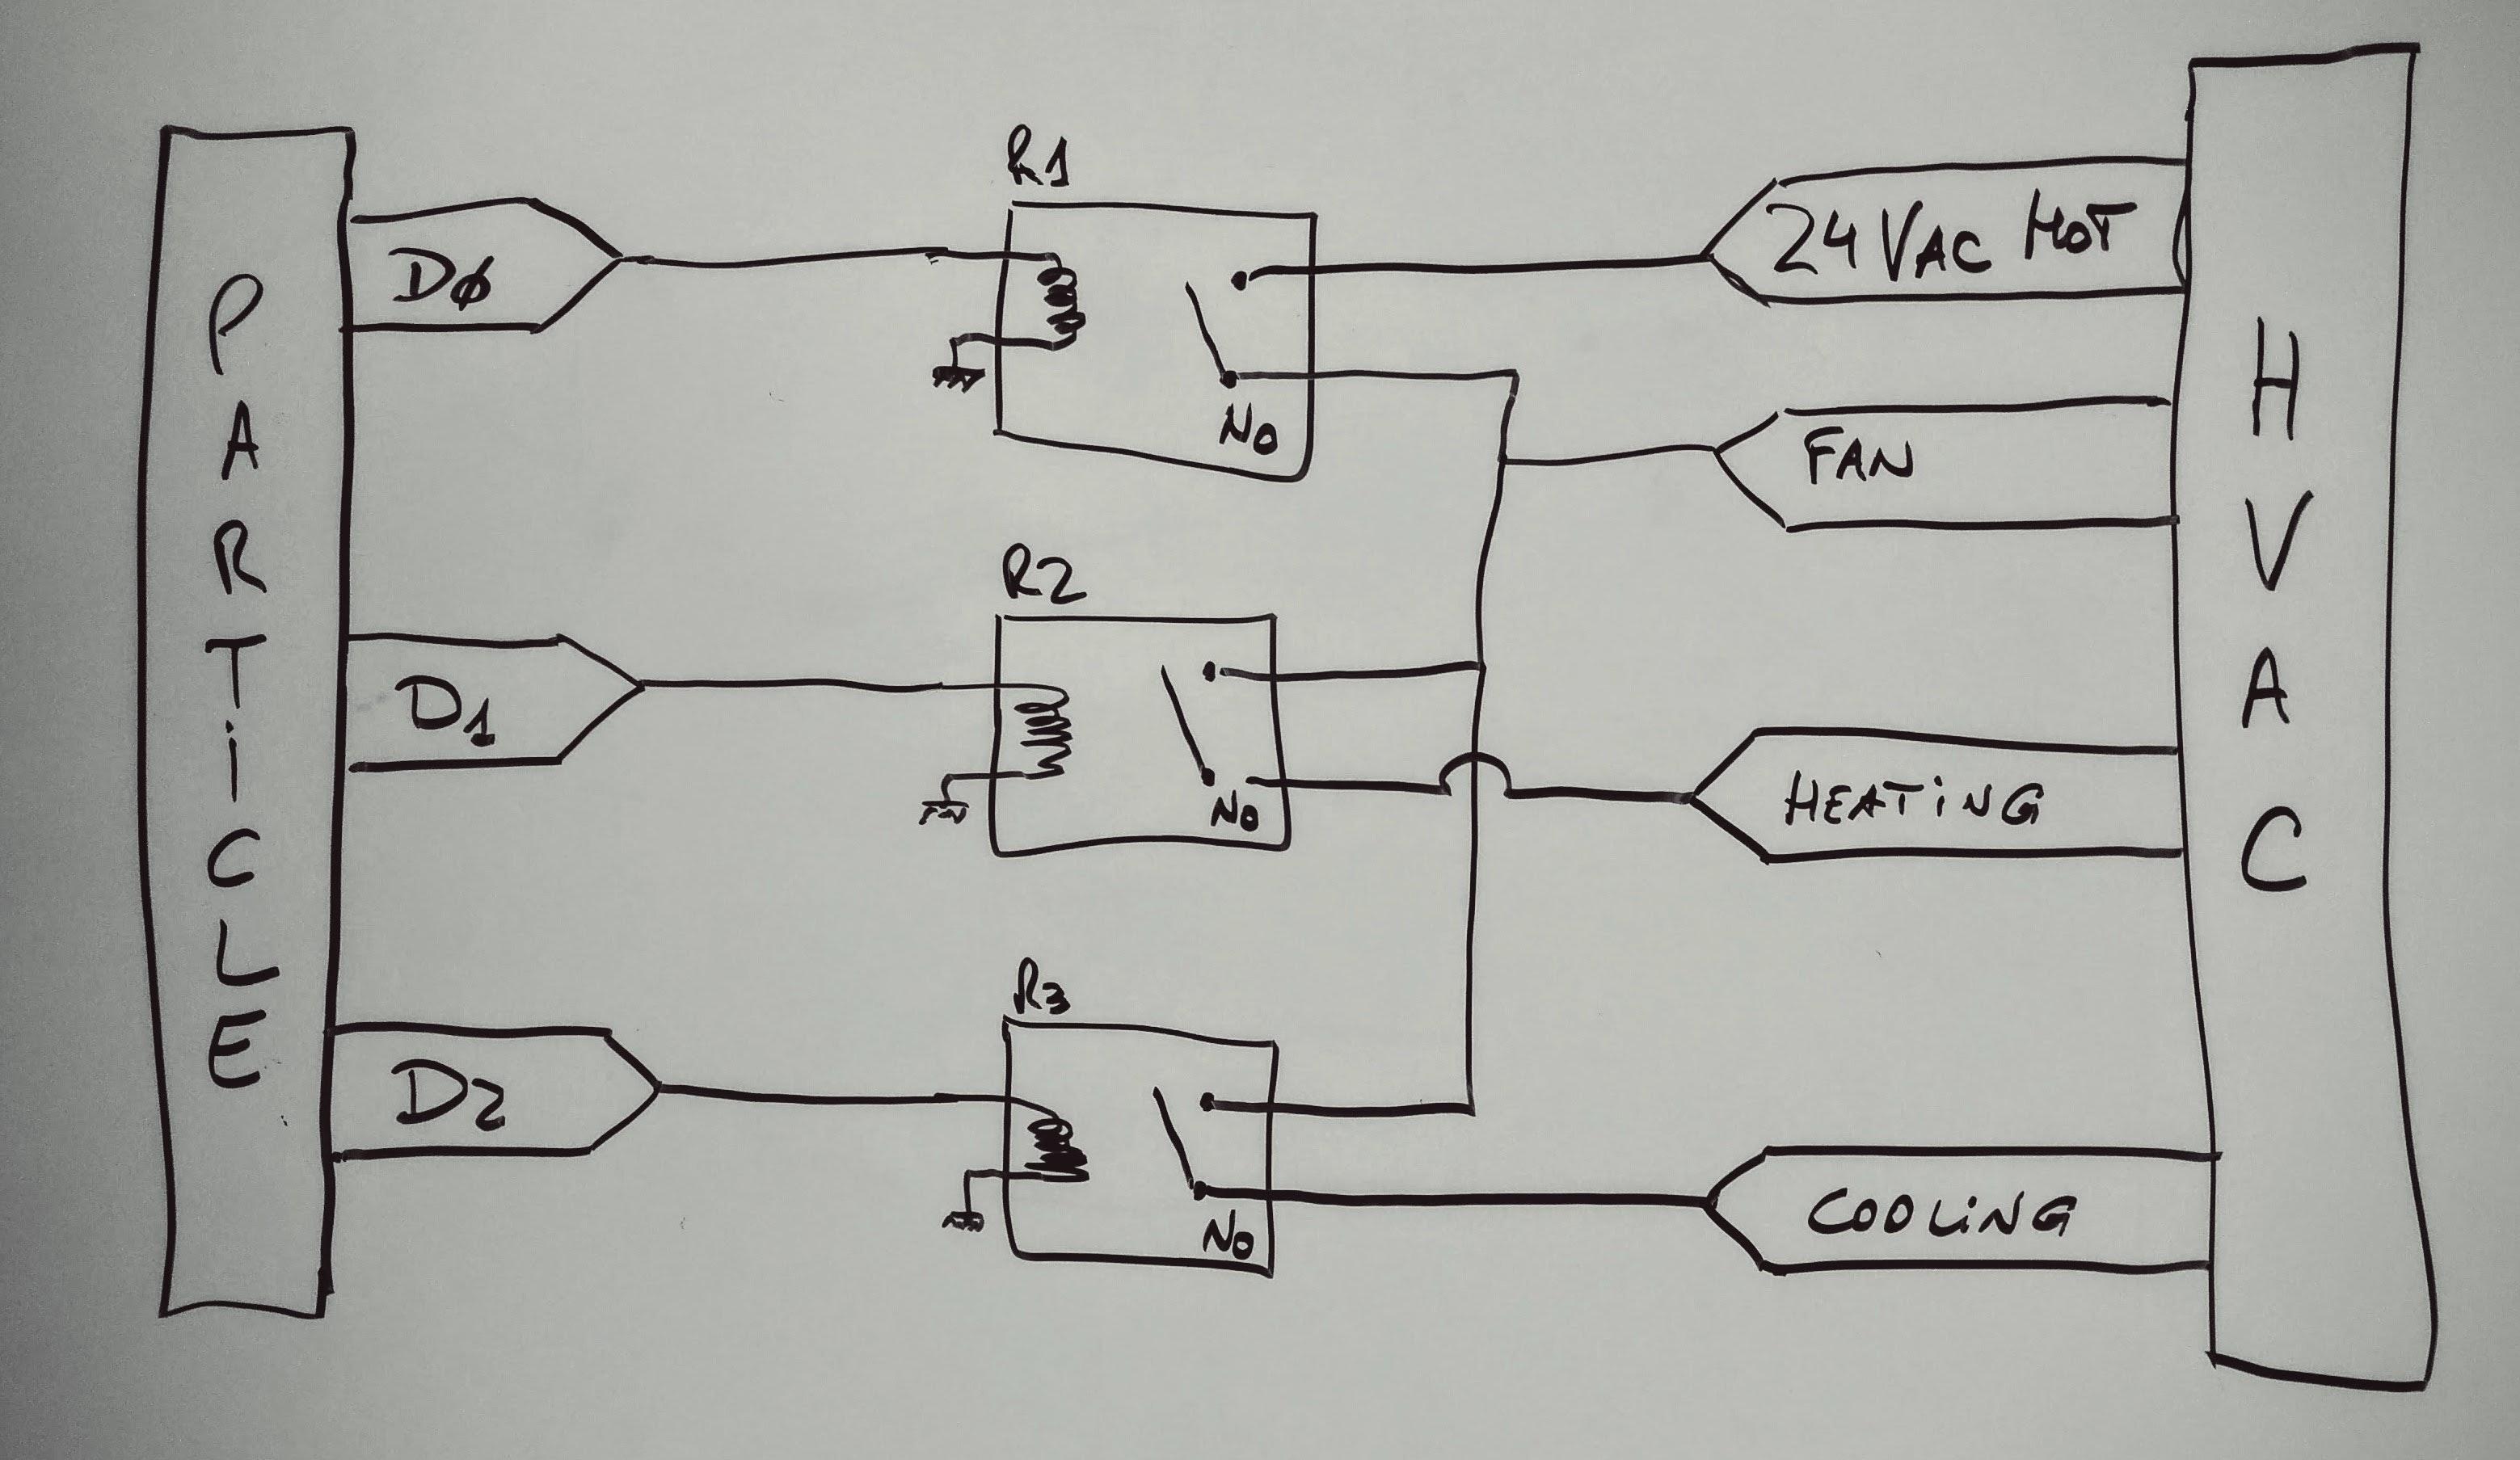 2002 Acura Mdx Bose Wiring Diagram Wire Data Schema Fuse Box Scintillating Mini Winnebago Schematic Photos 2004